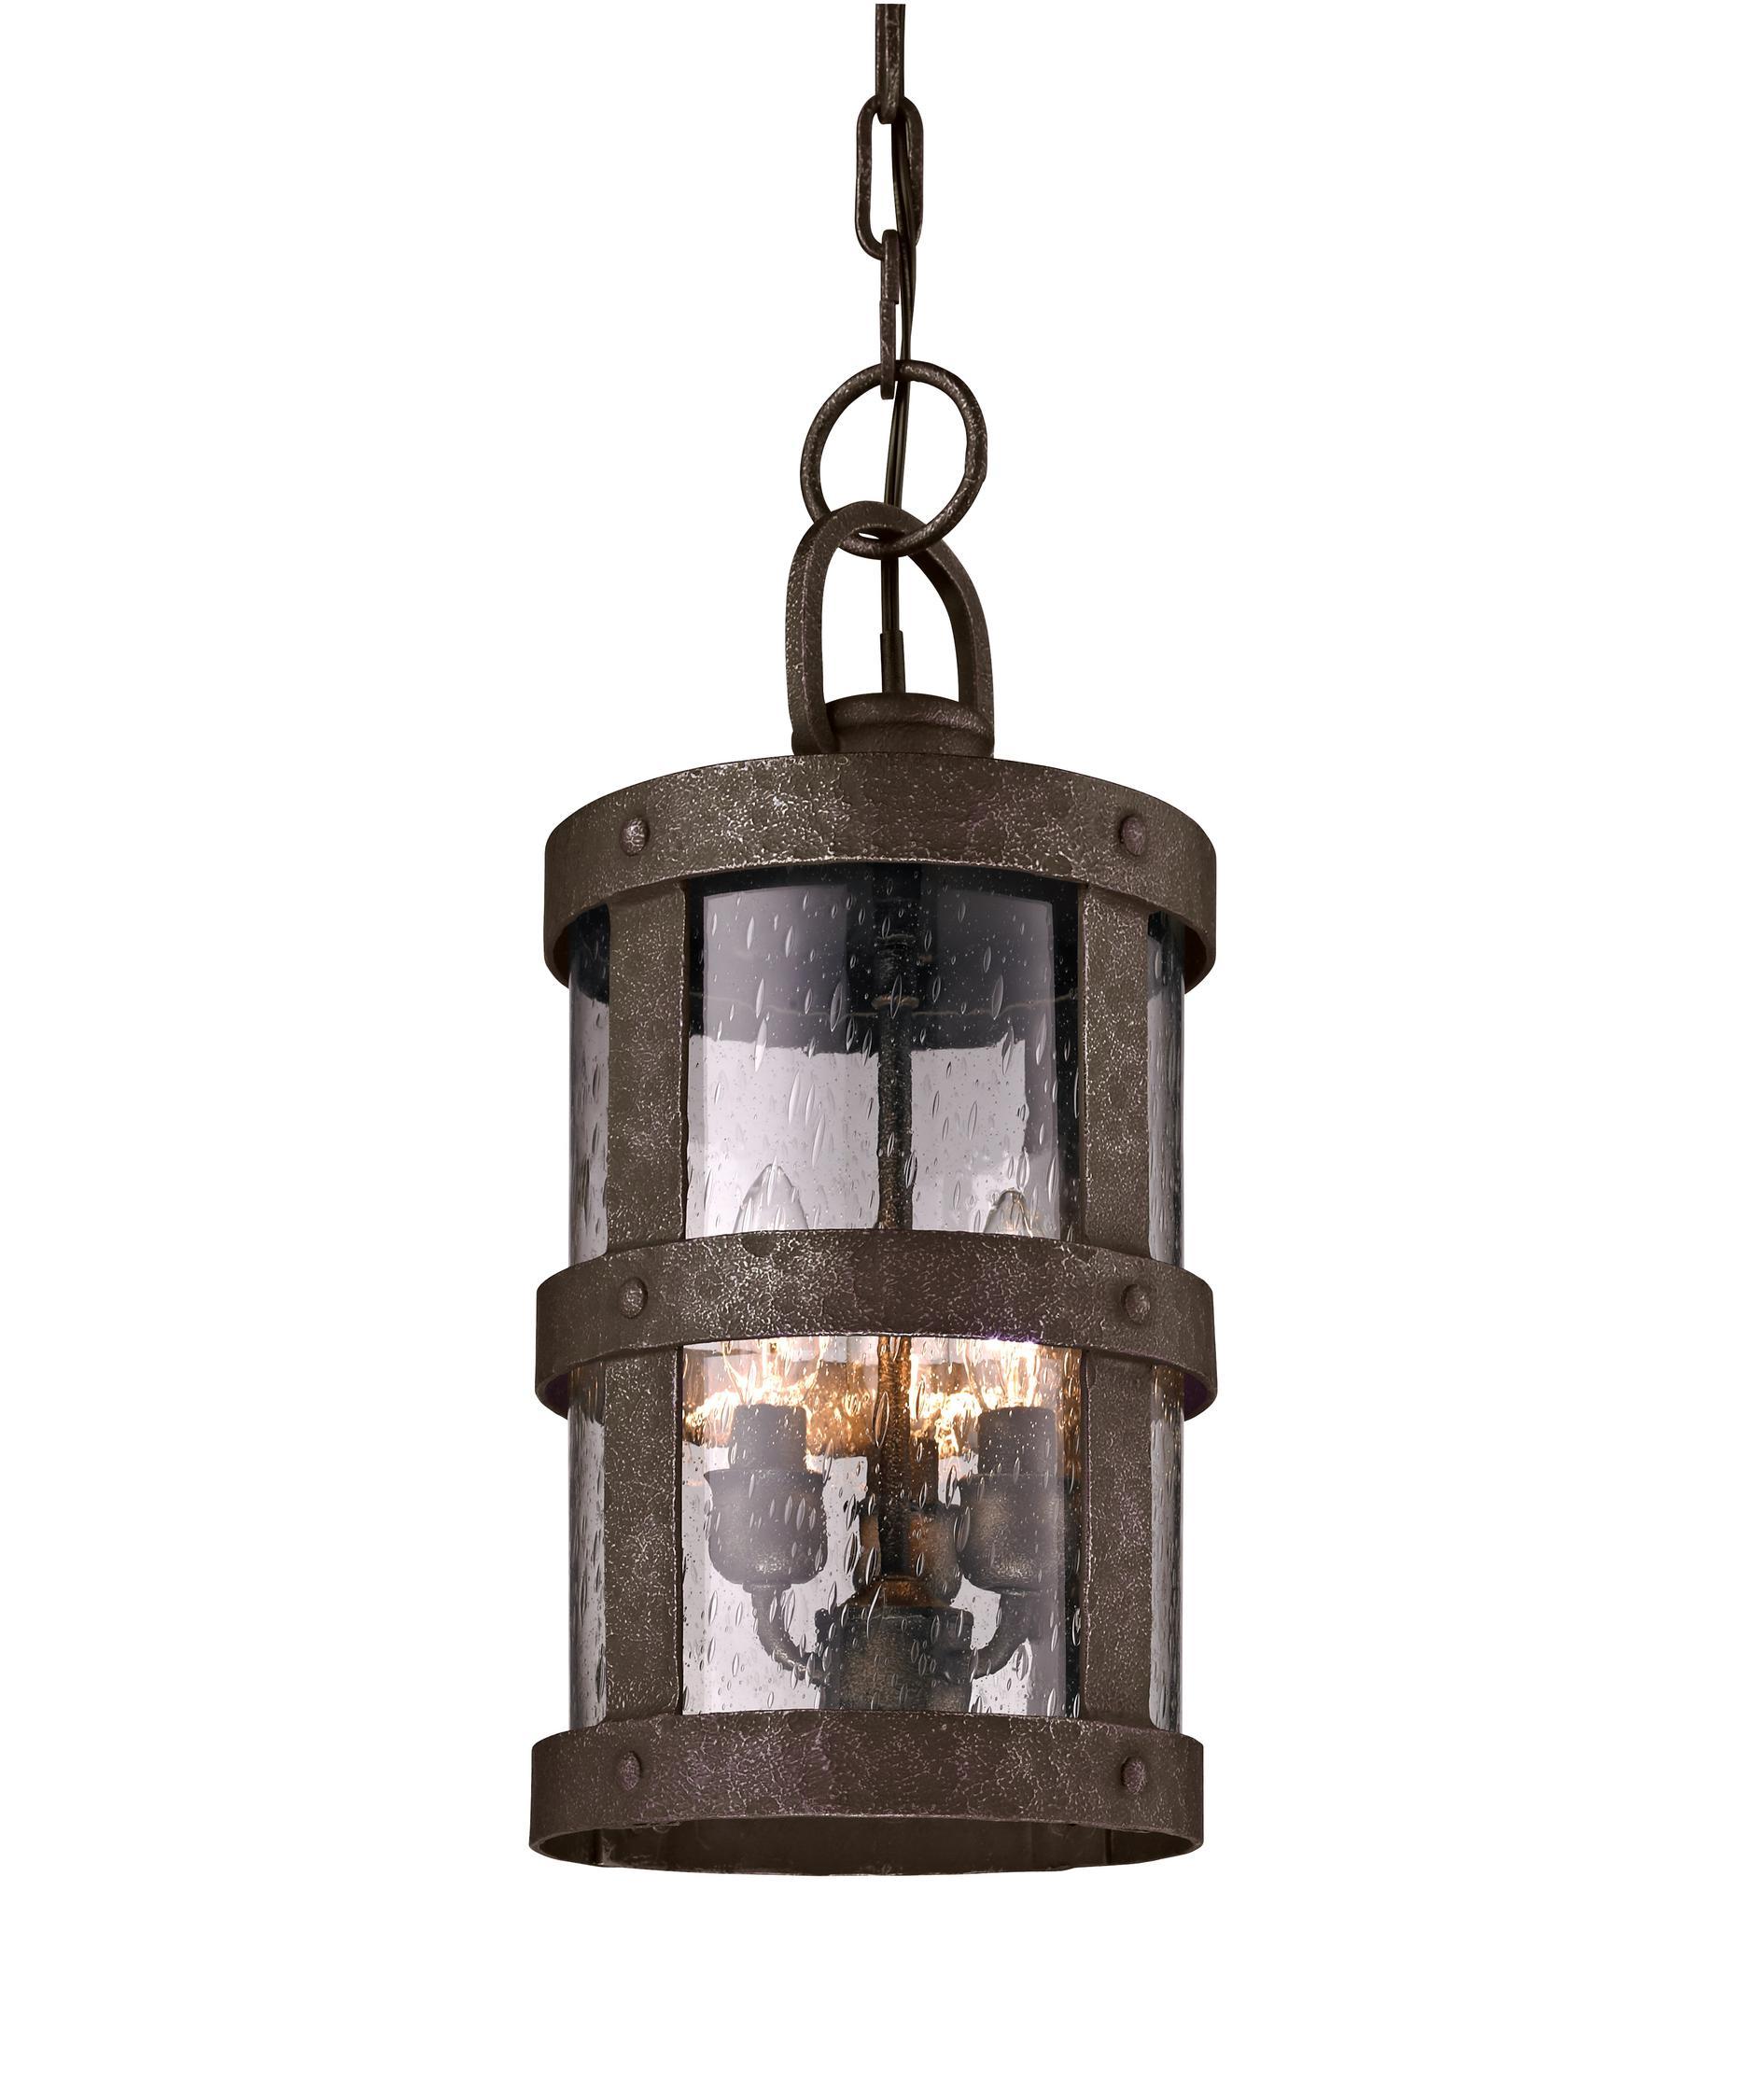 Outdoor hanging lamp - Troy Lighting F3317 Barbosa 8 Inch Wide 3 Light Outdoor Hanging Lantern Capitol Lighting 1 800lighting Com